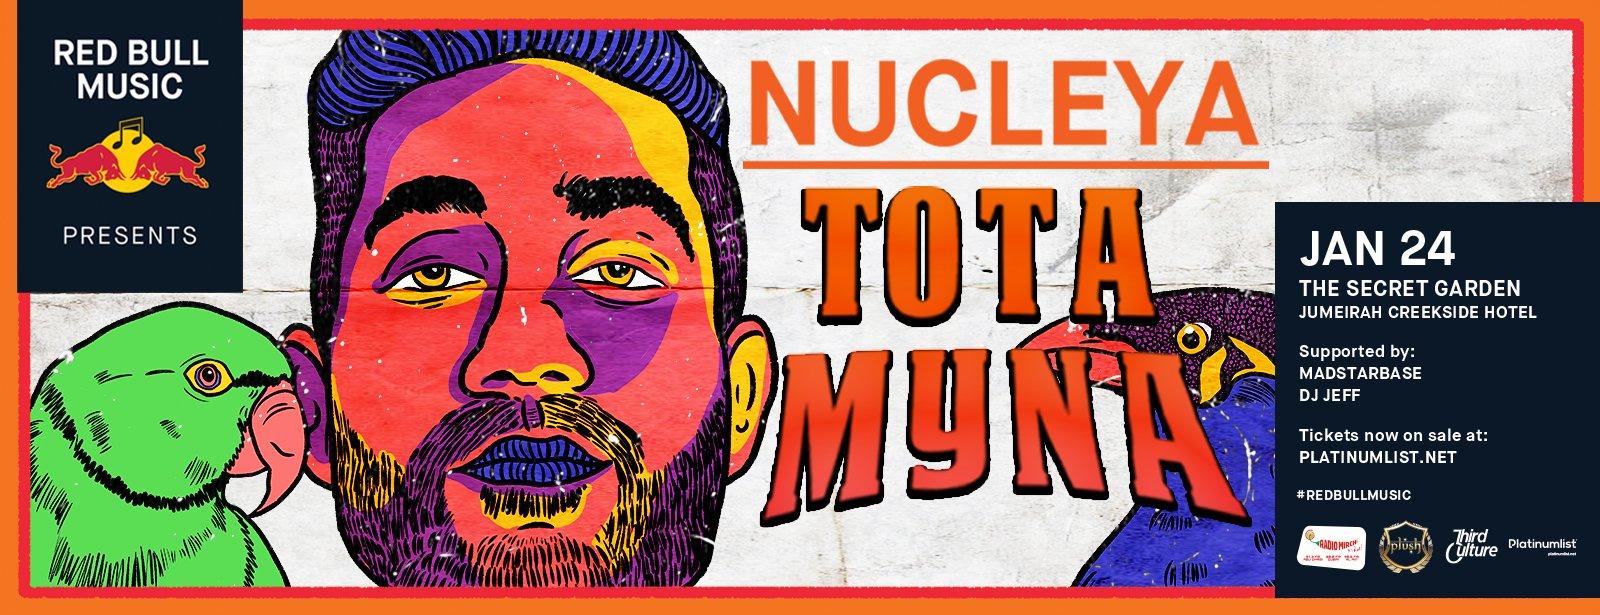 Red Bull Music presents Tota Myna album by Nucleya - Coming Soon in UAE